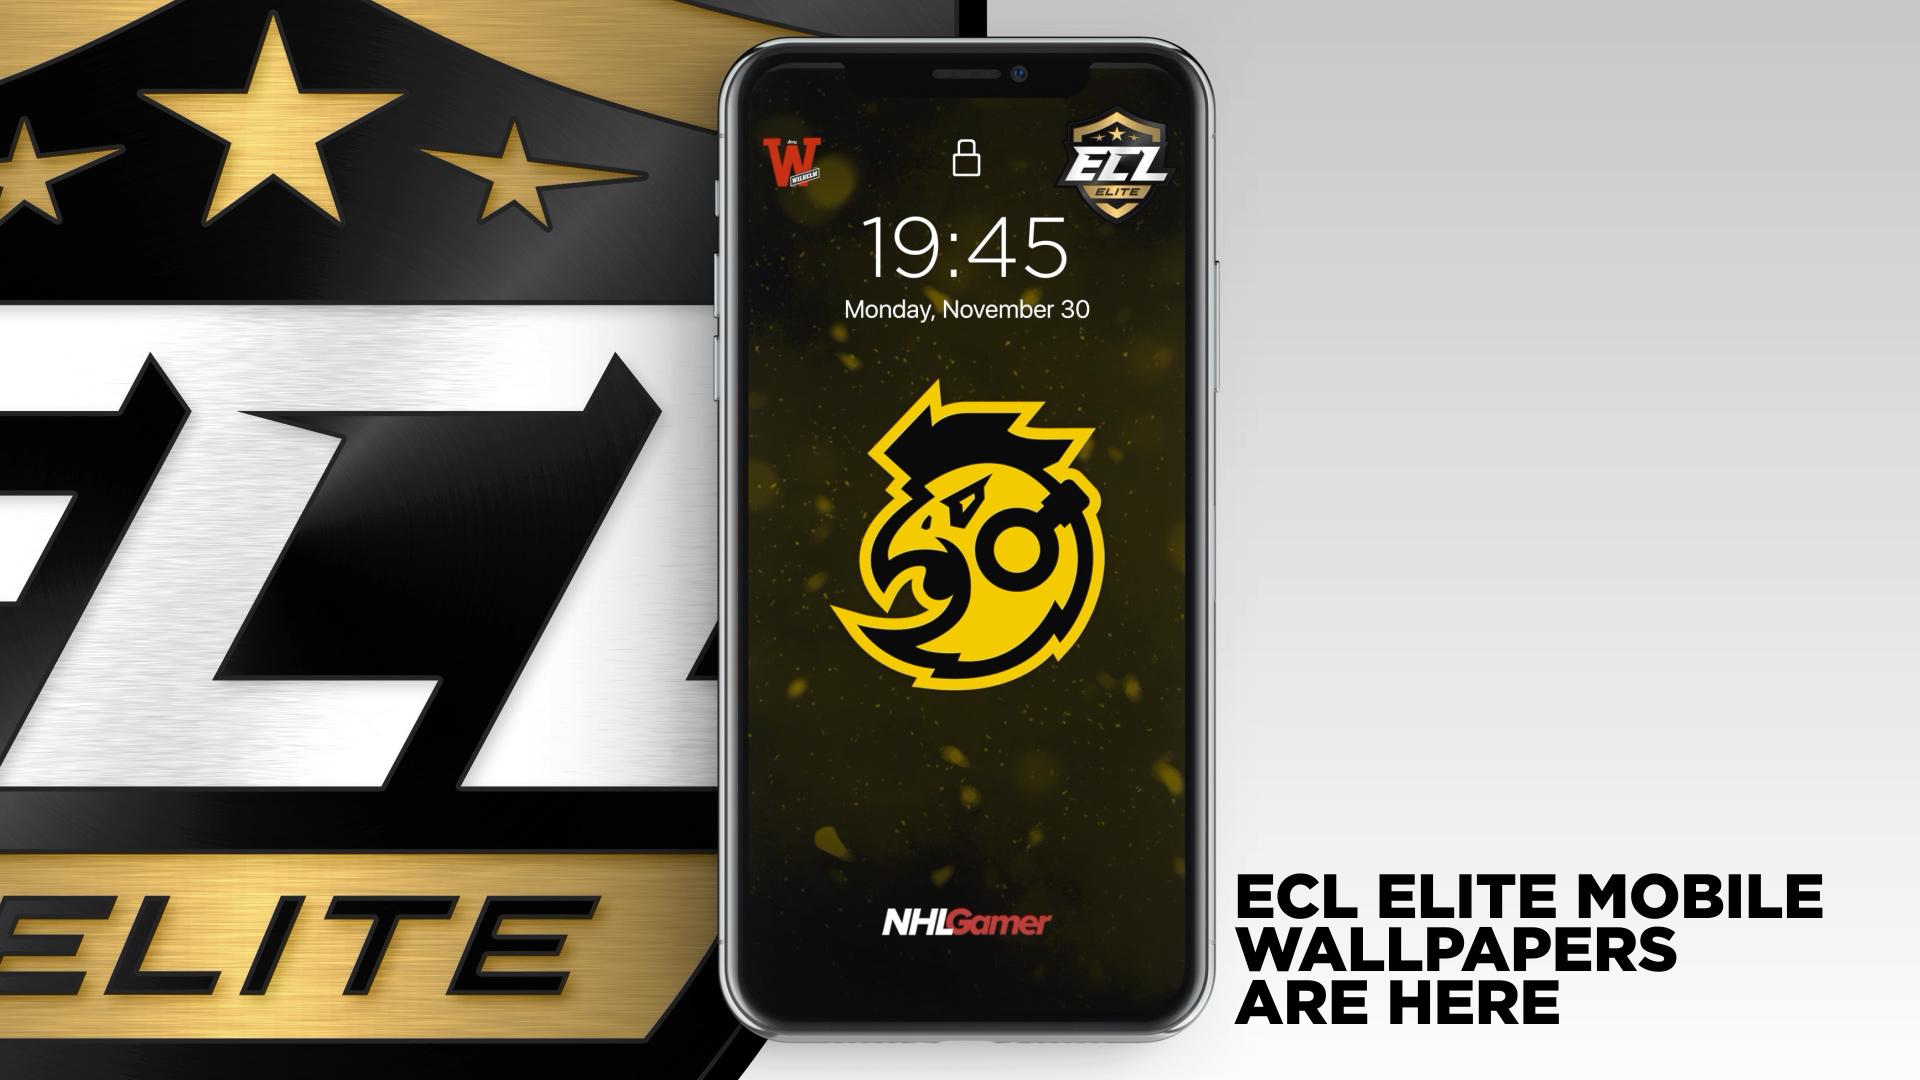 ECL_Elite_Mobile_Wallpapers.jpg